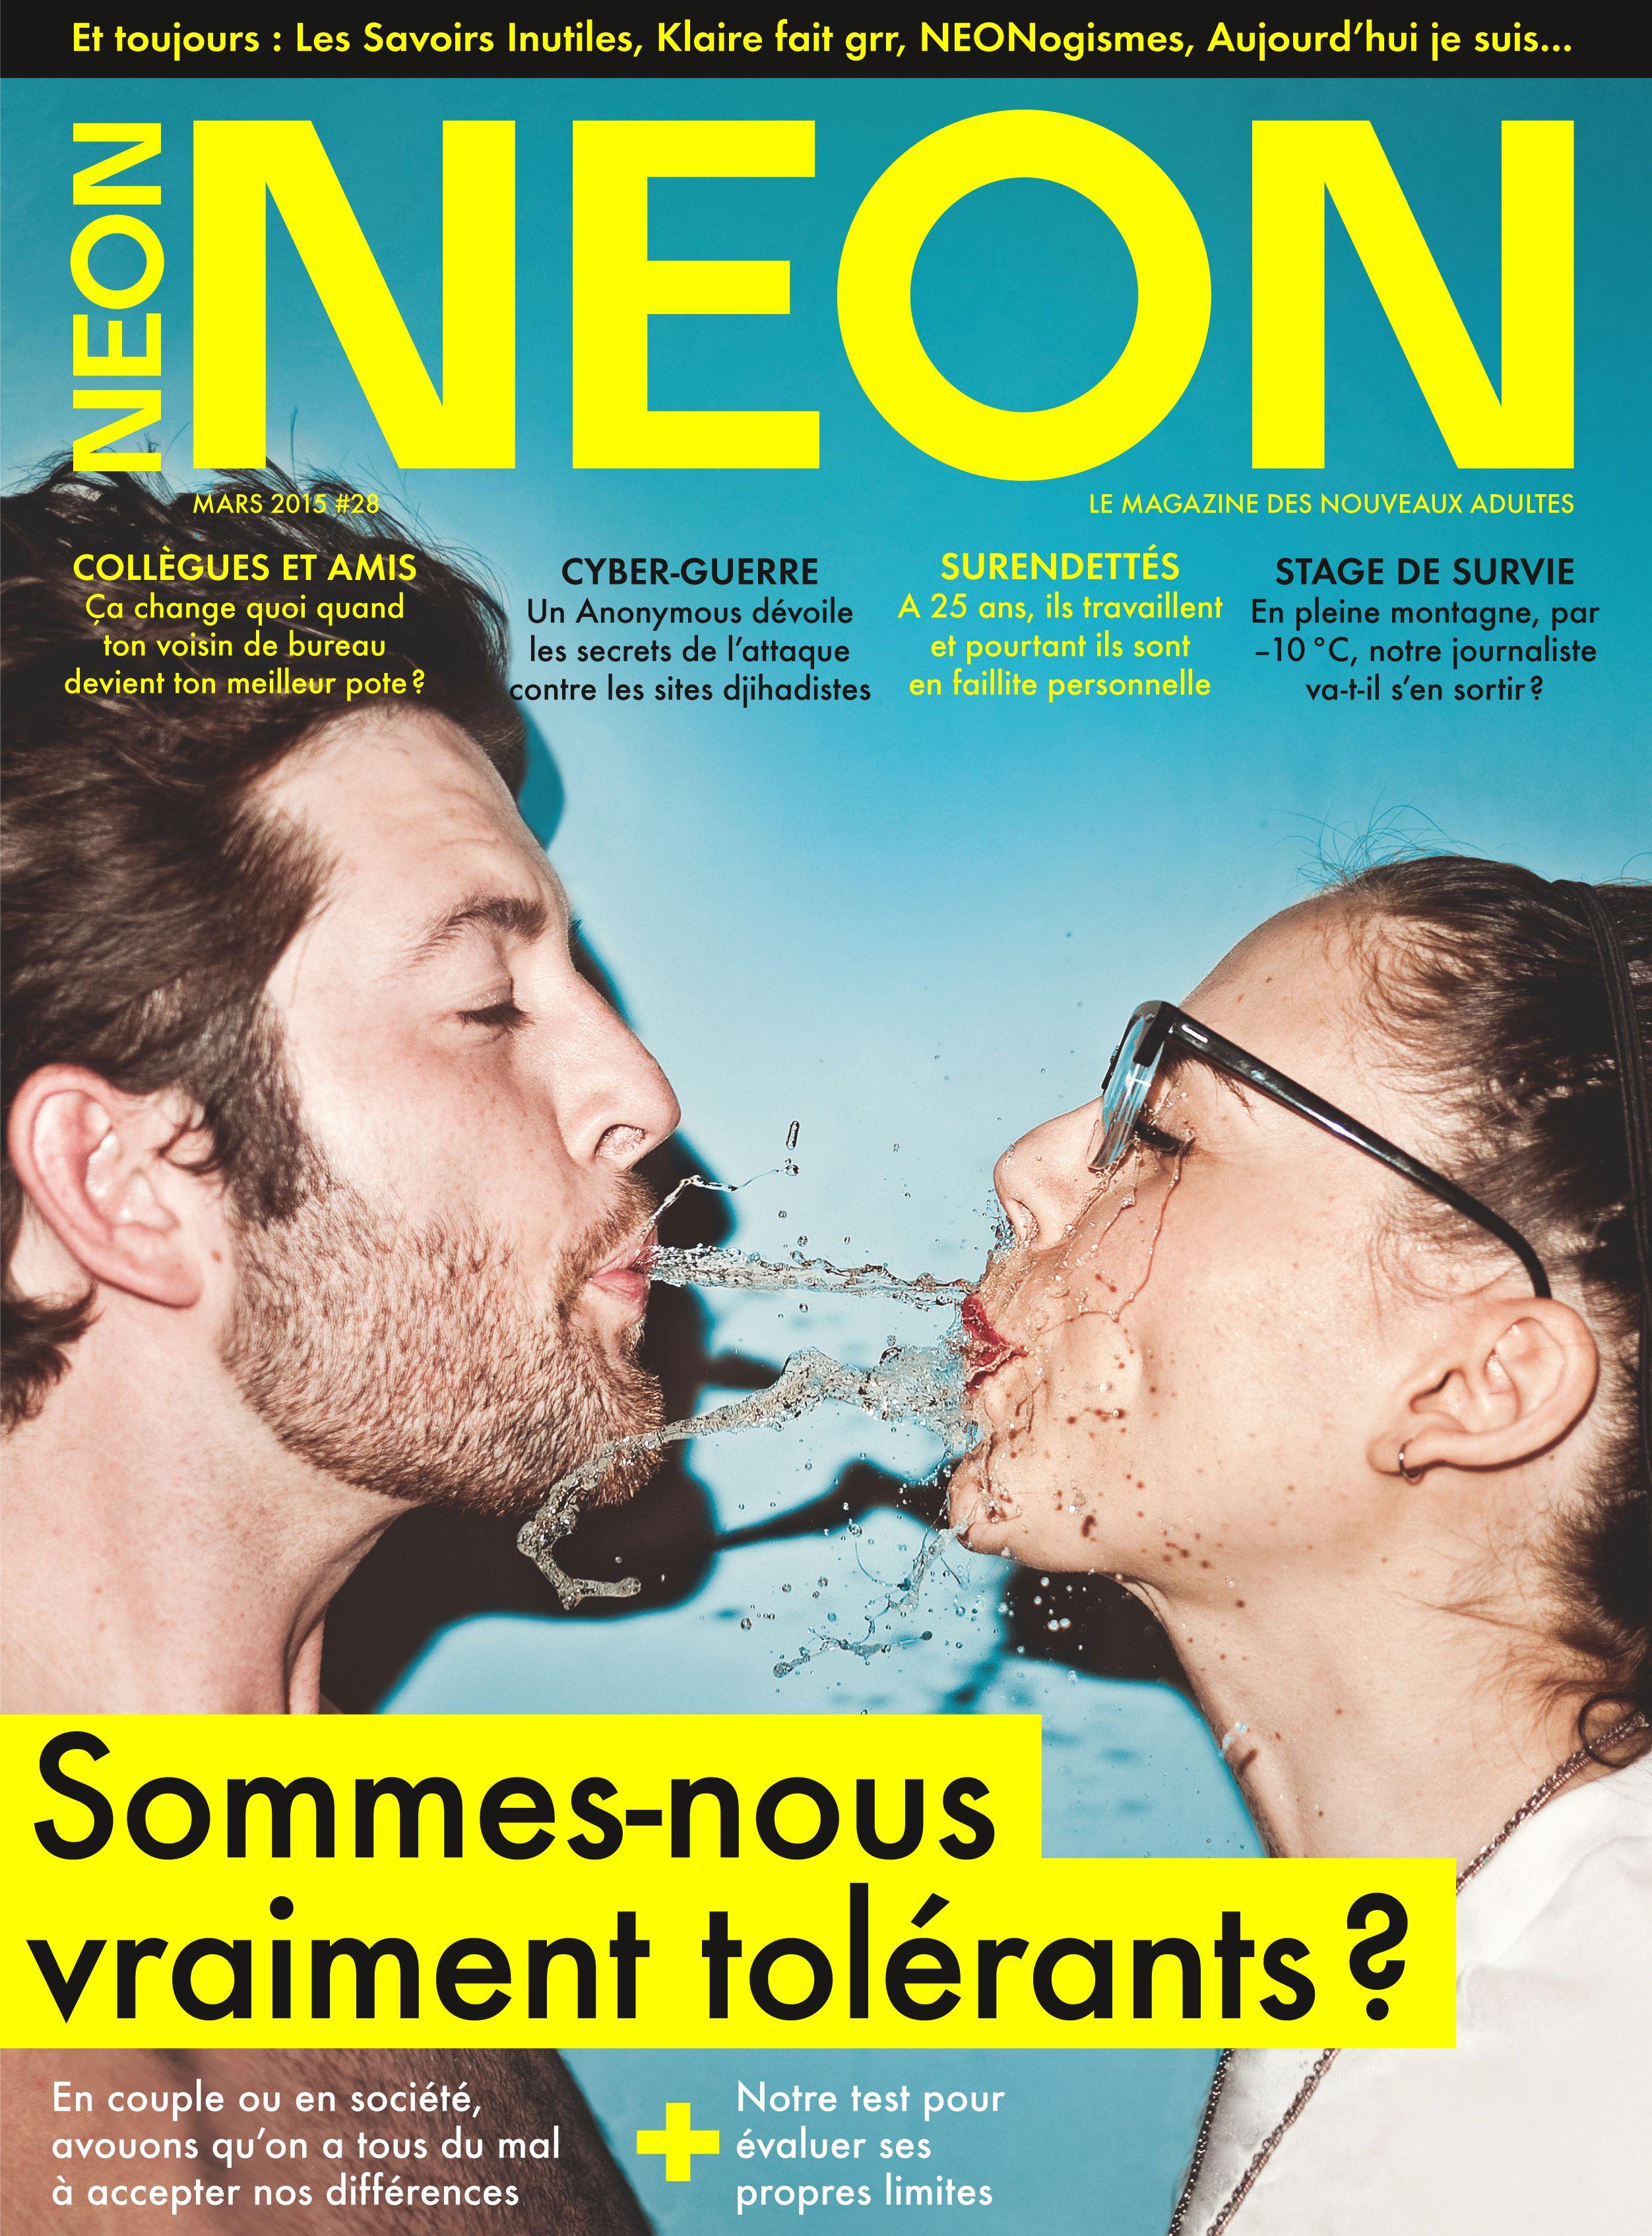 Magazine NEON n°28 - mars 2015